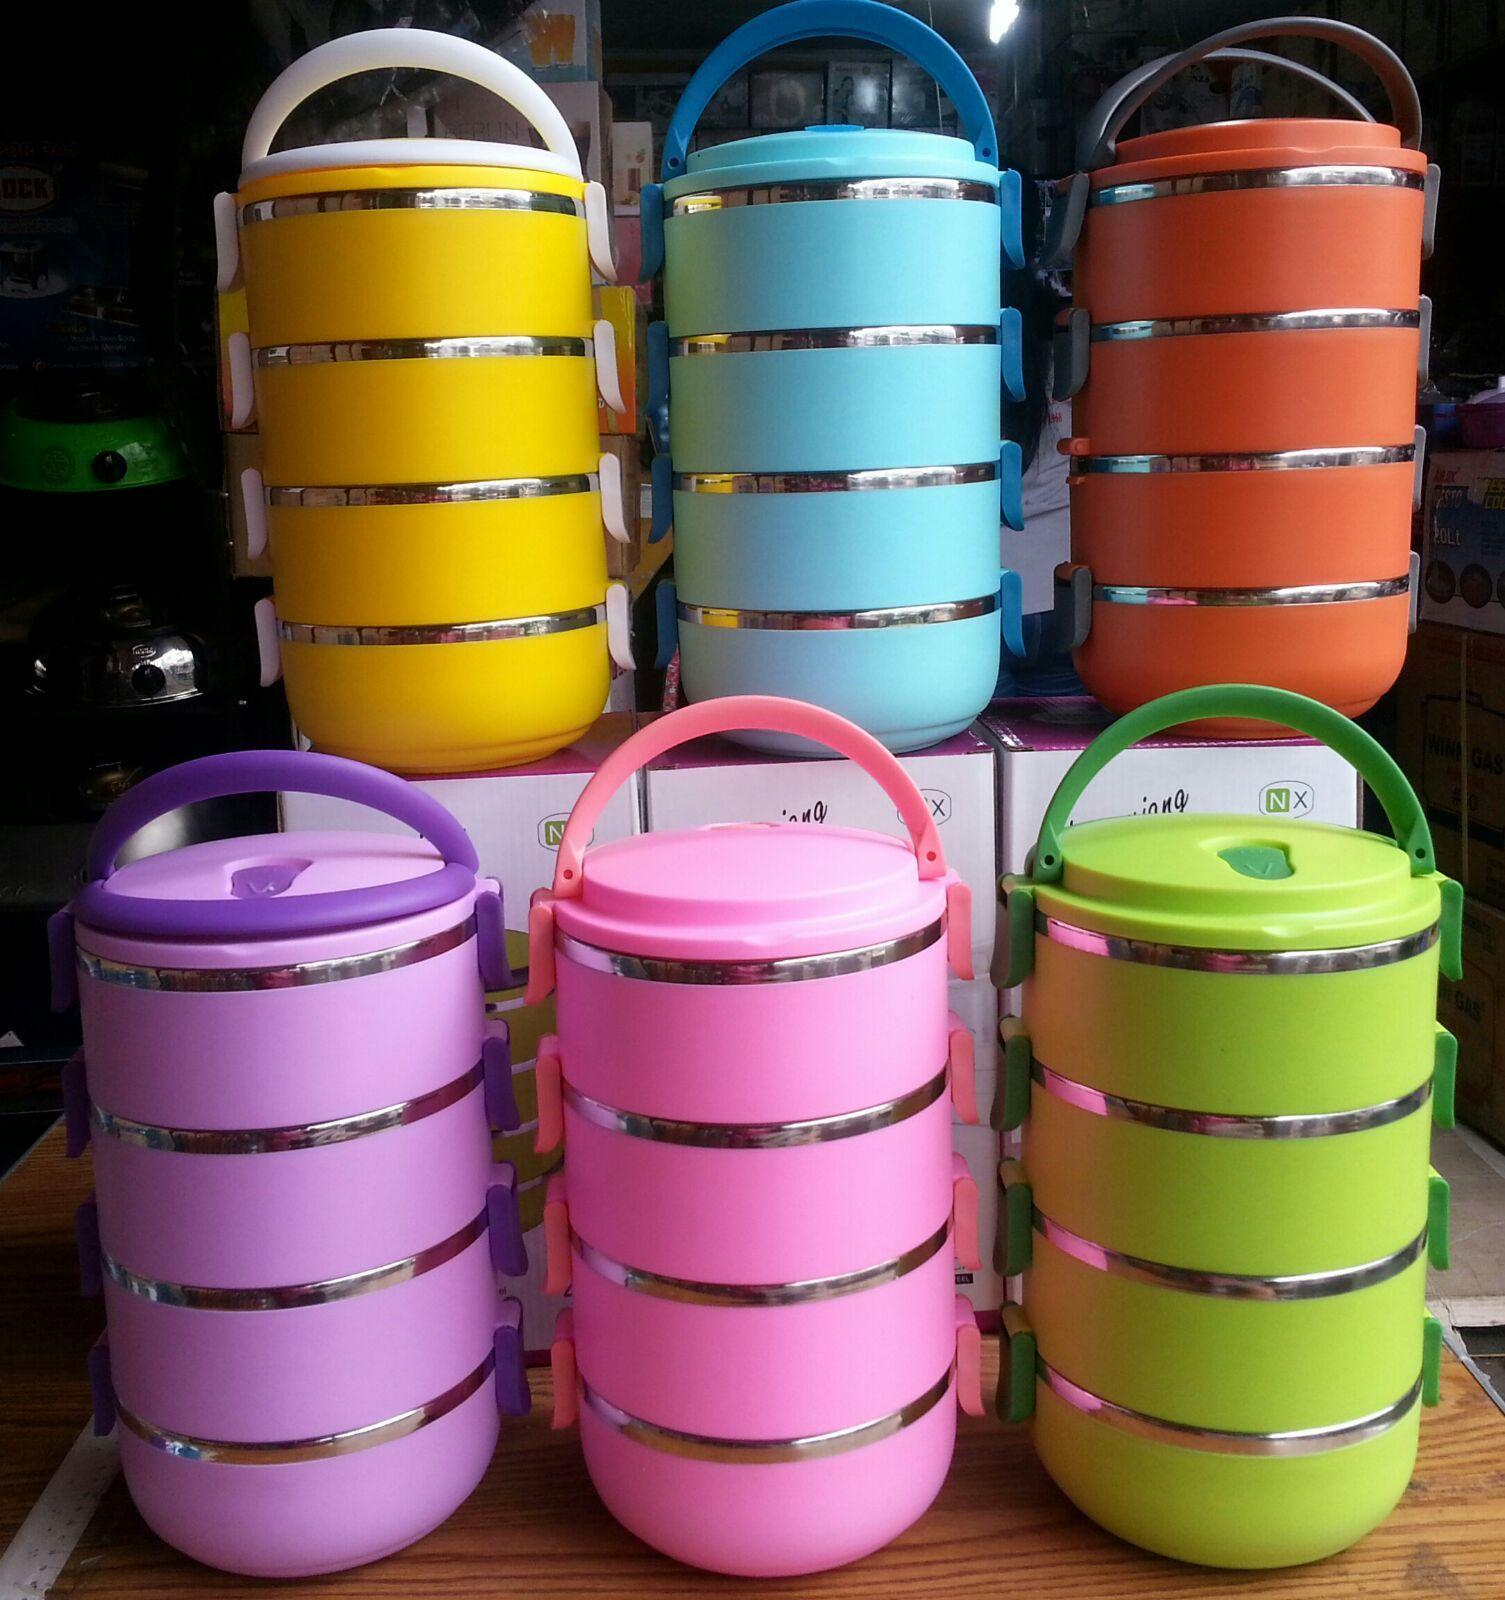 Qoo10 Re Stock Lunch Box Stainless Rantang Polos 3 Dan 4 Susun Dodawa Lihat Semua Gambar Barang